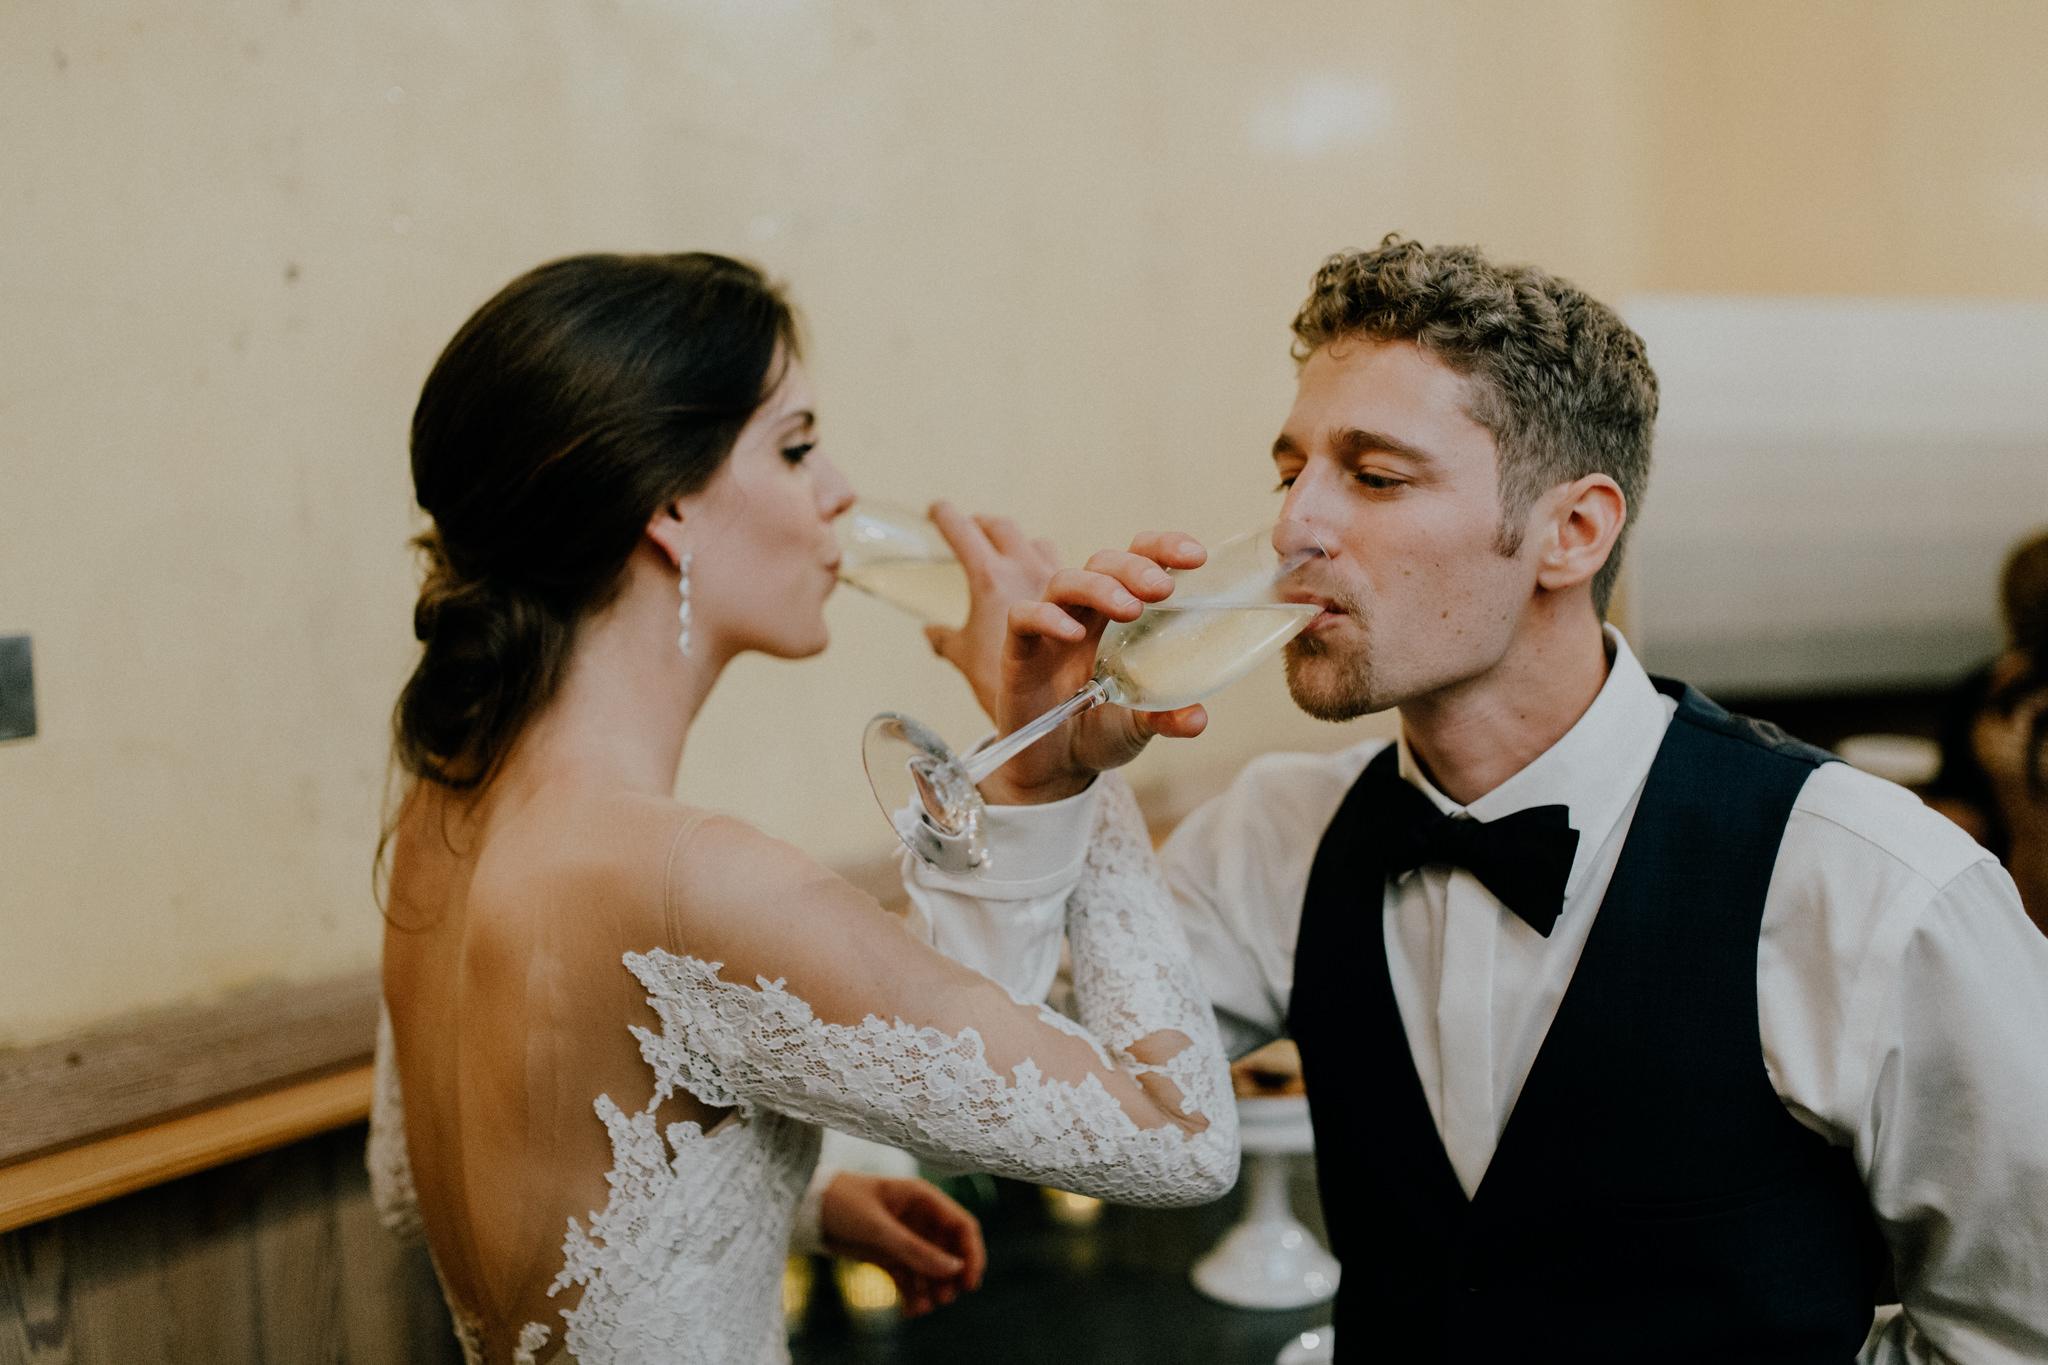 wedding-headlands-center-for-the-arts-sausalito-143.jpg